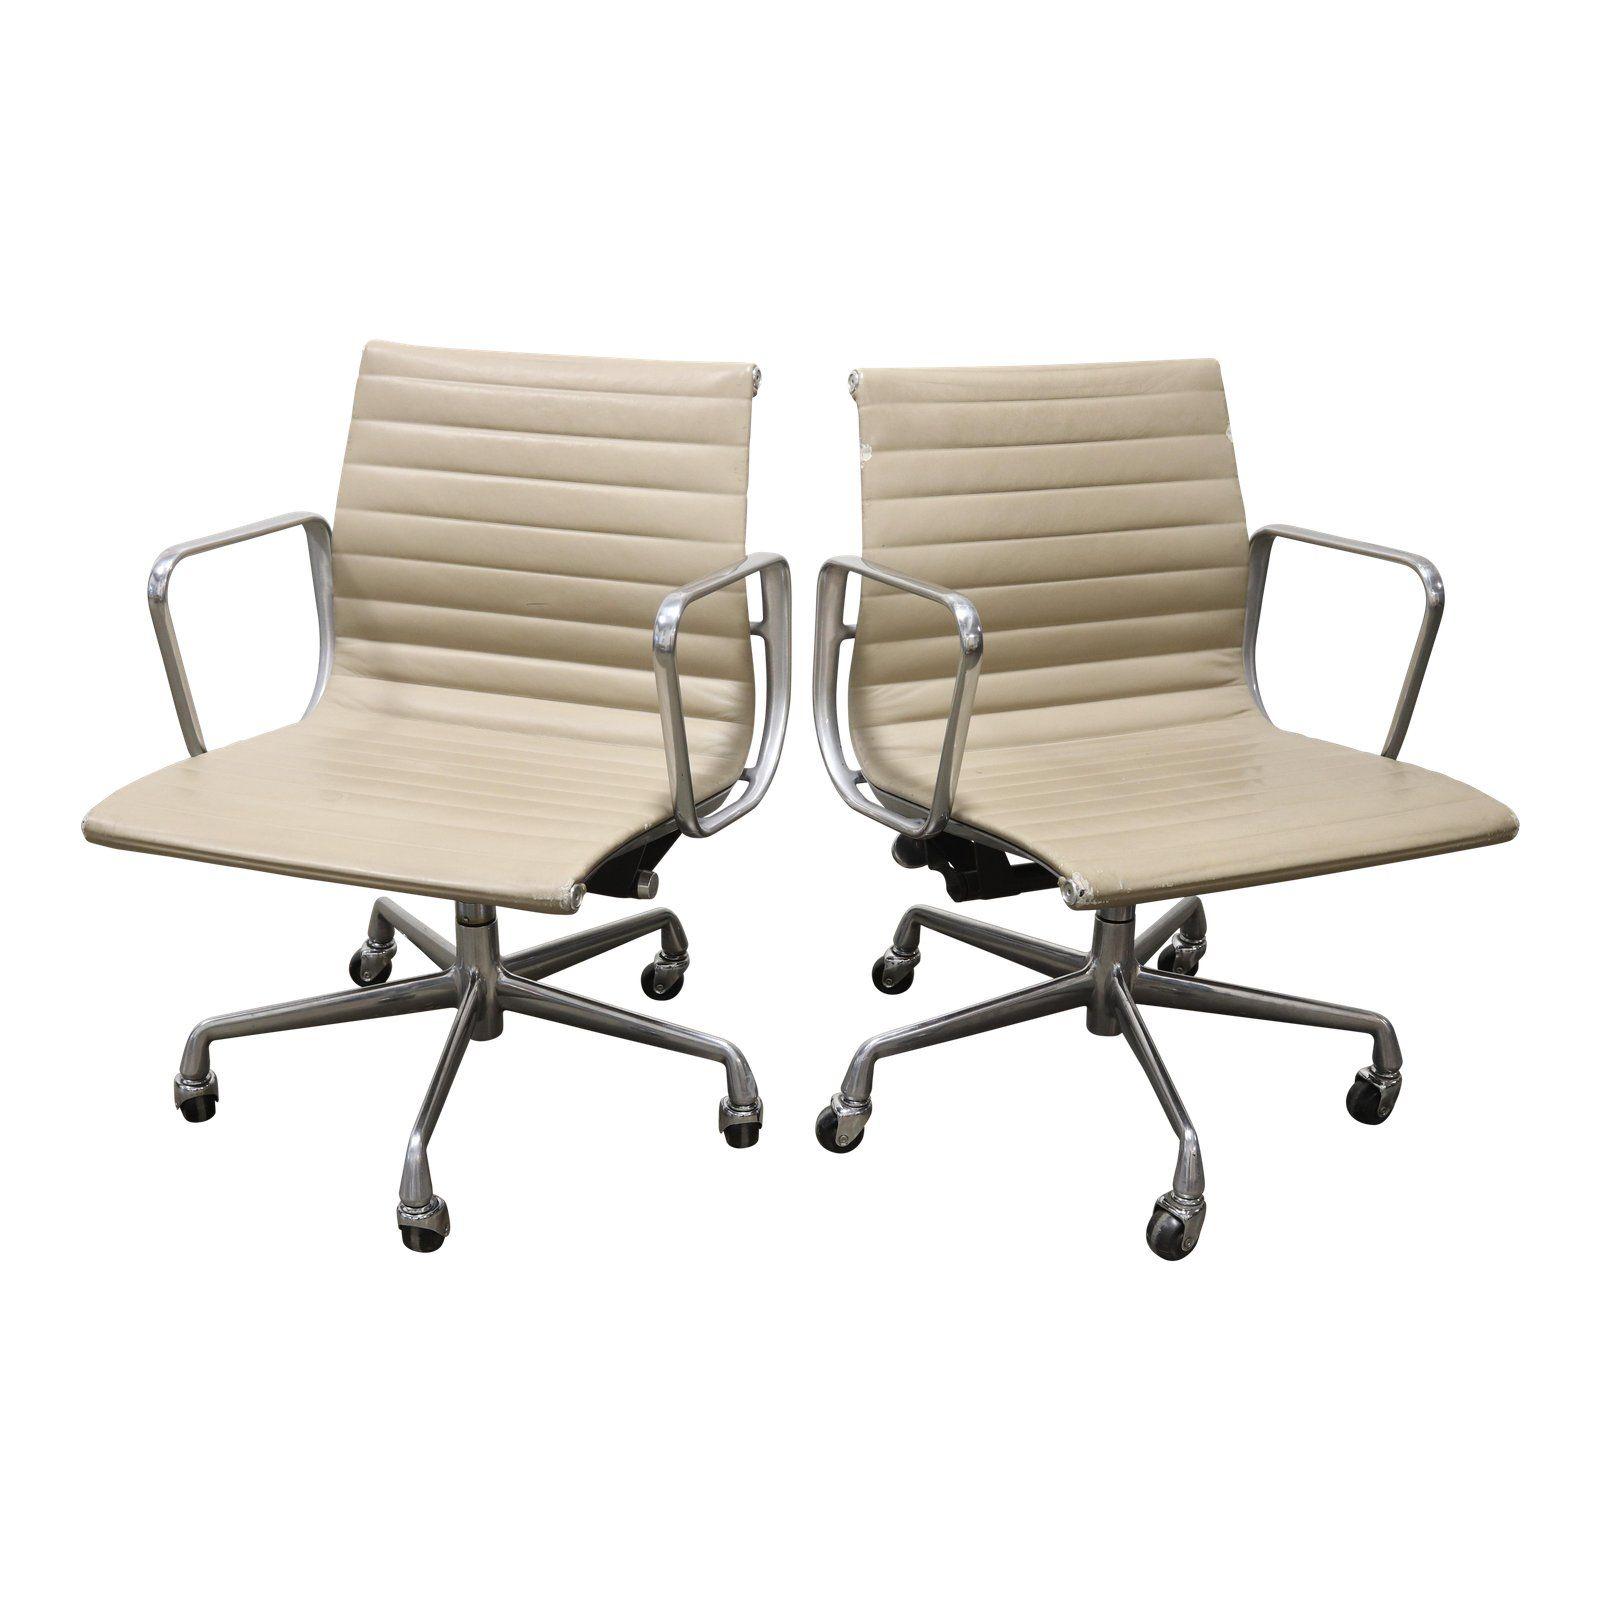 1990s Vintage Herman Miller Eames Aluminum Group Management Chair